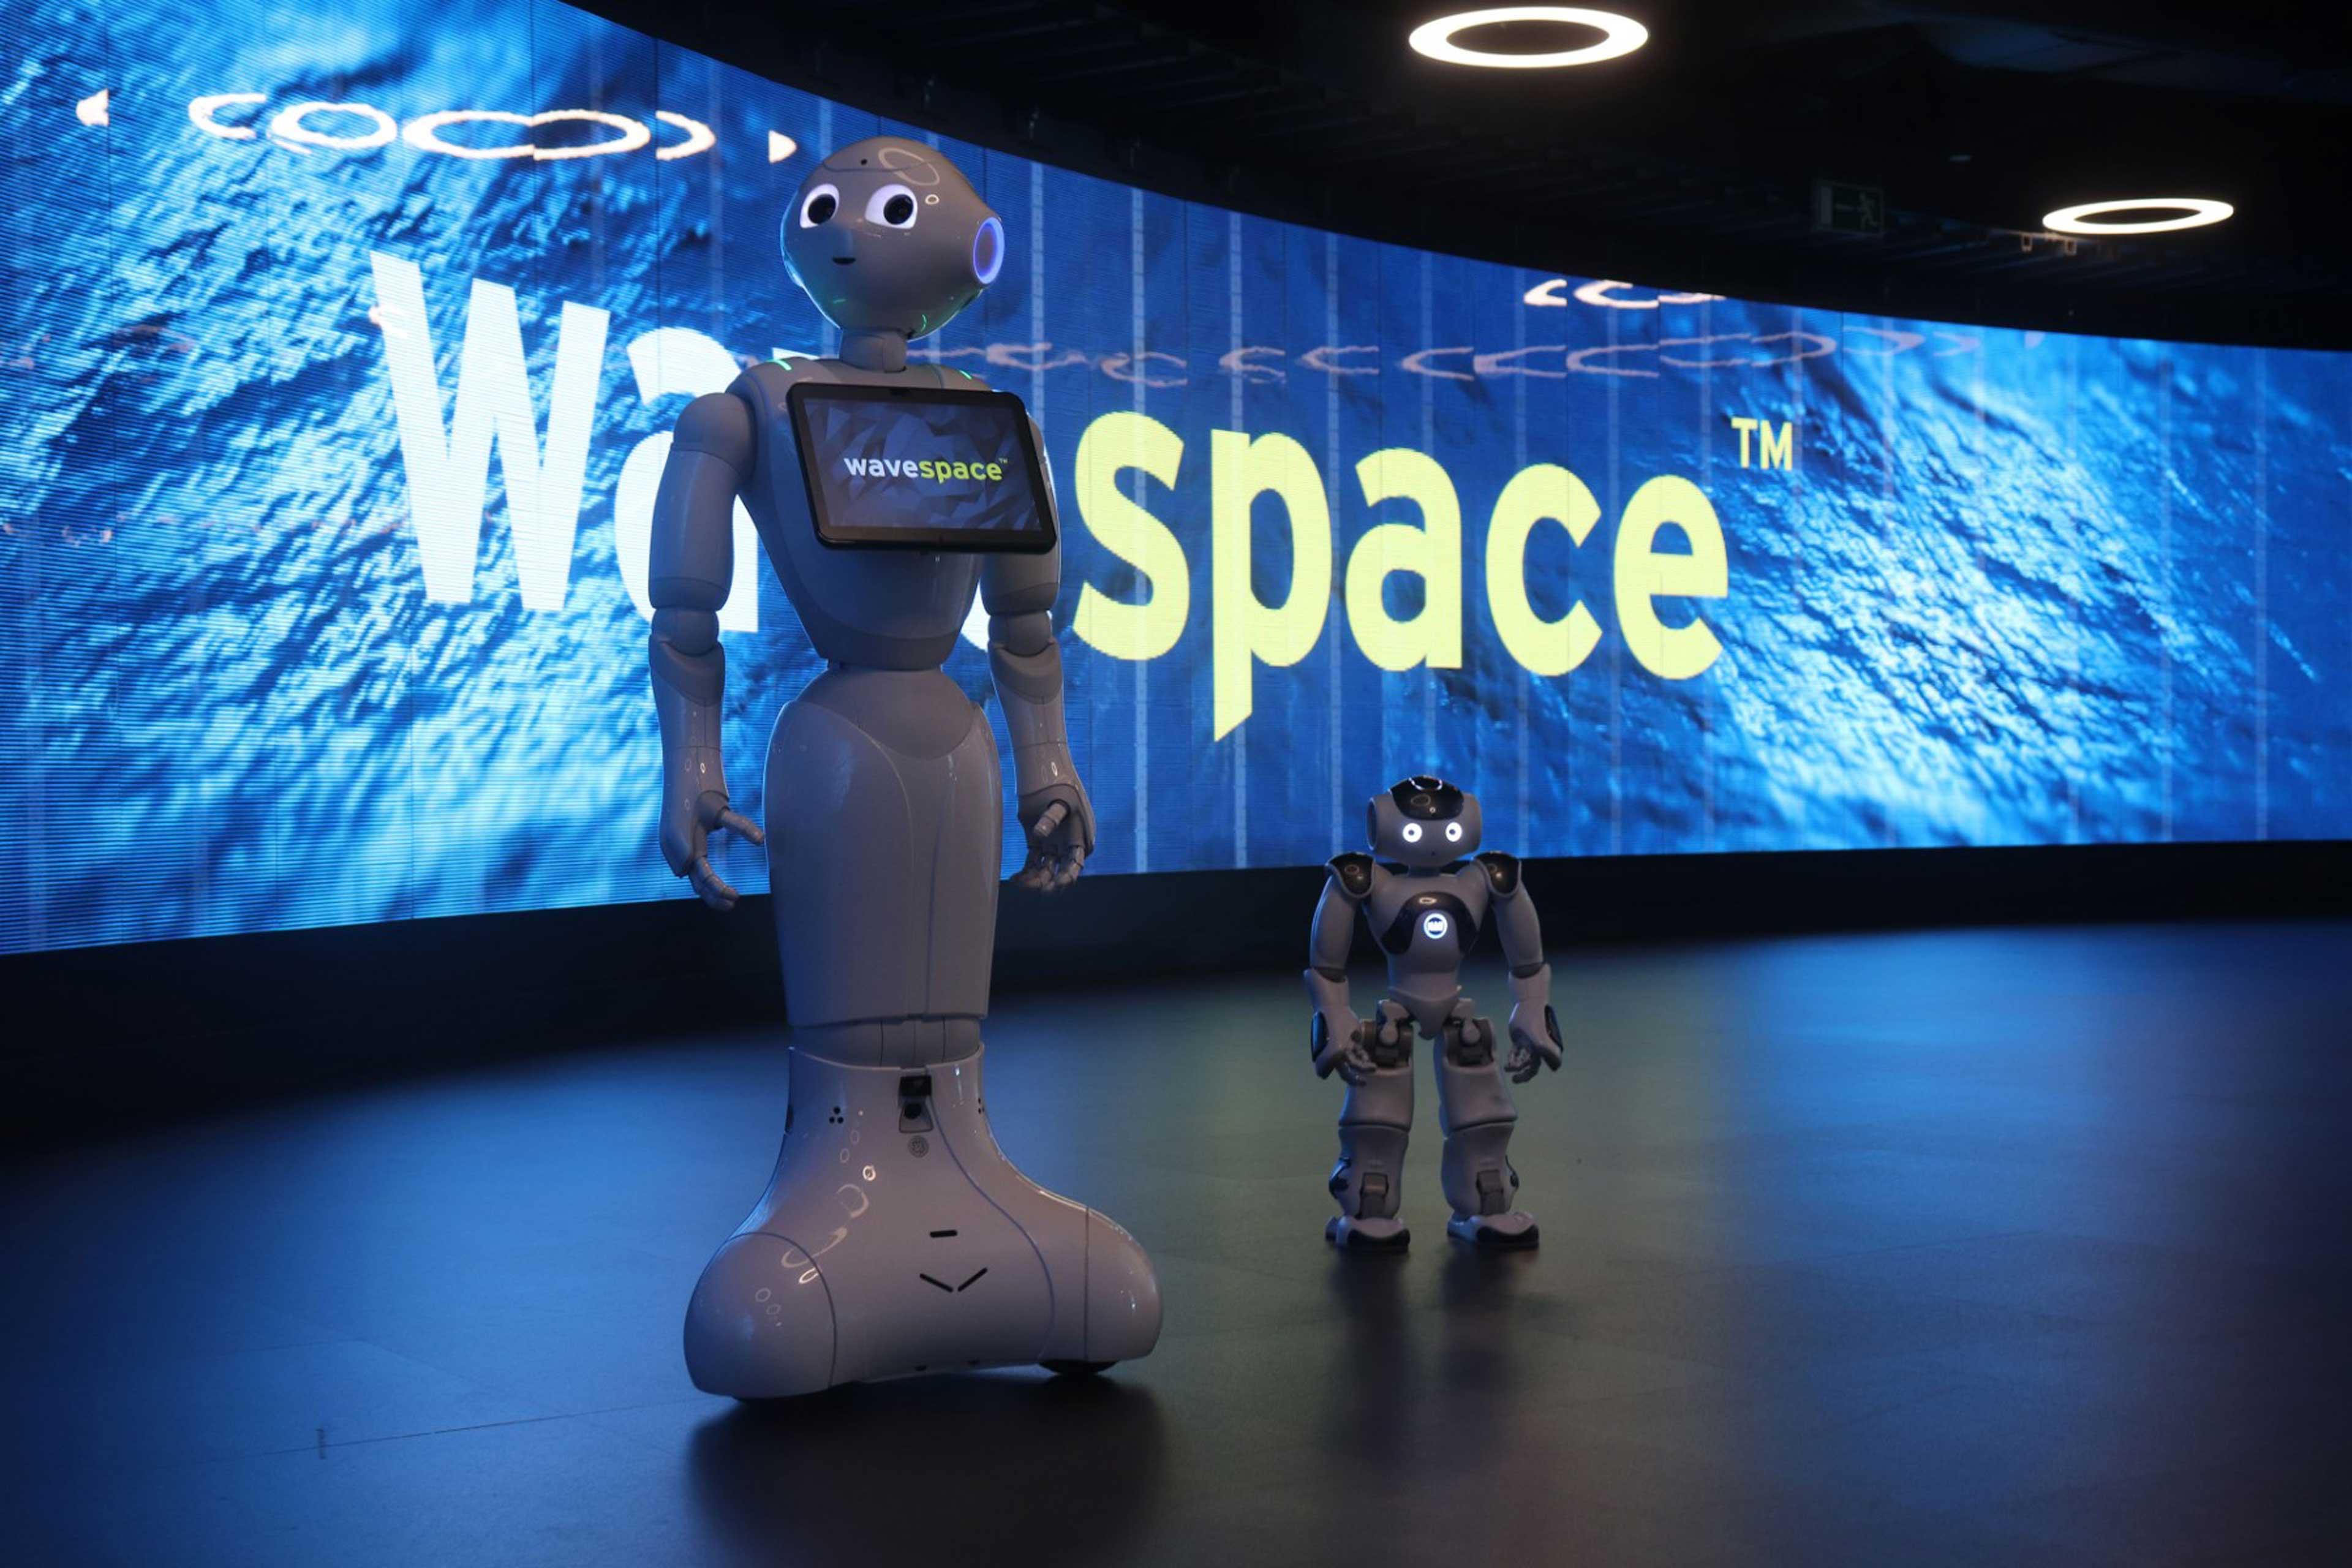 ey-wavespace-madrid-futuristic-bots